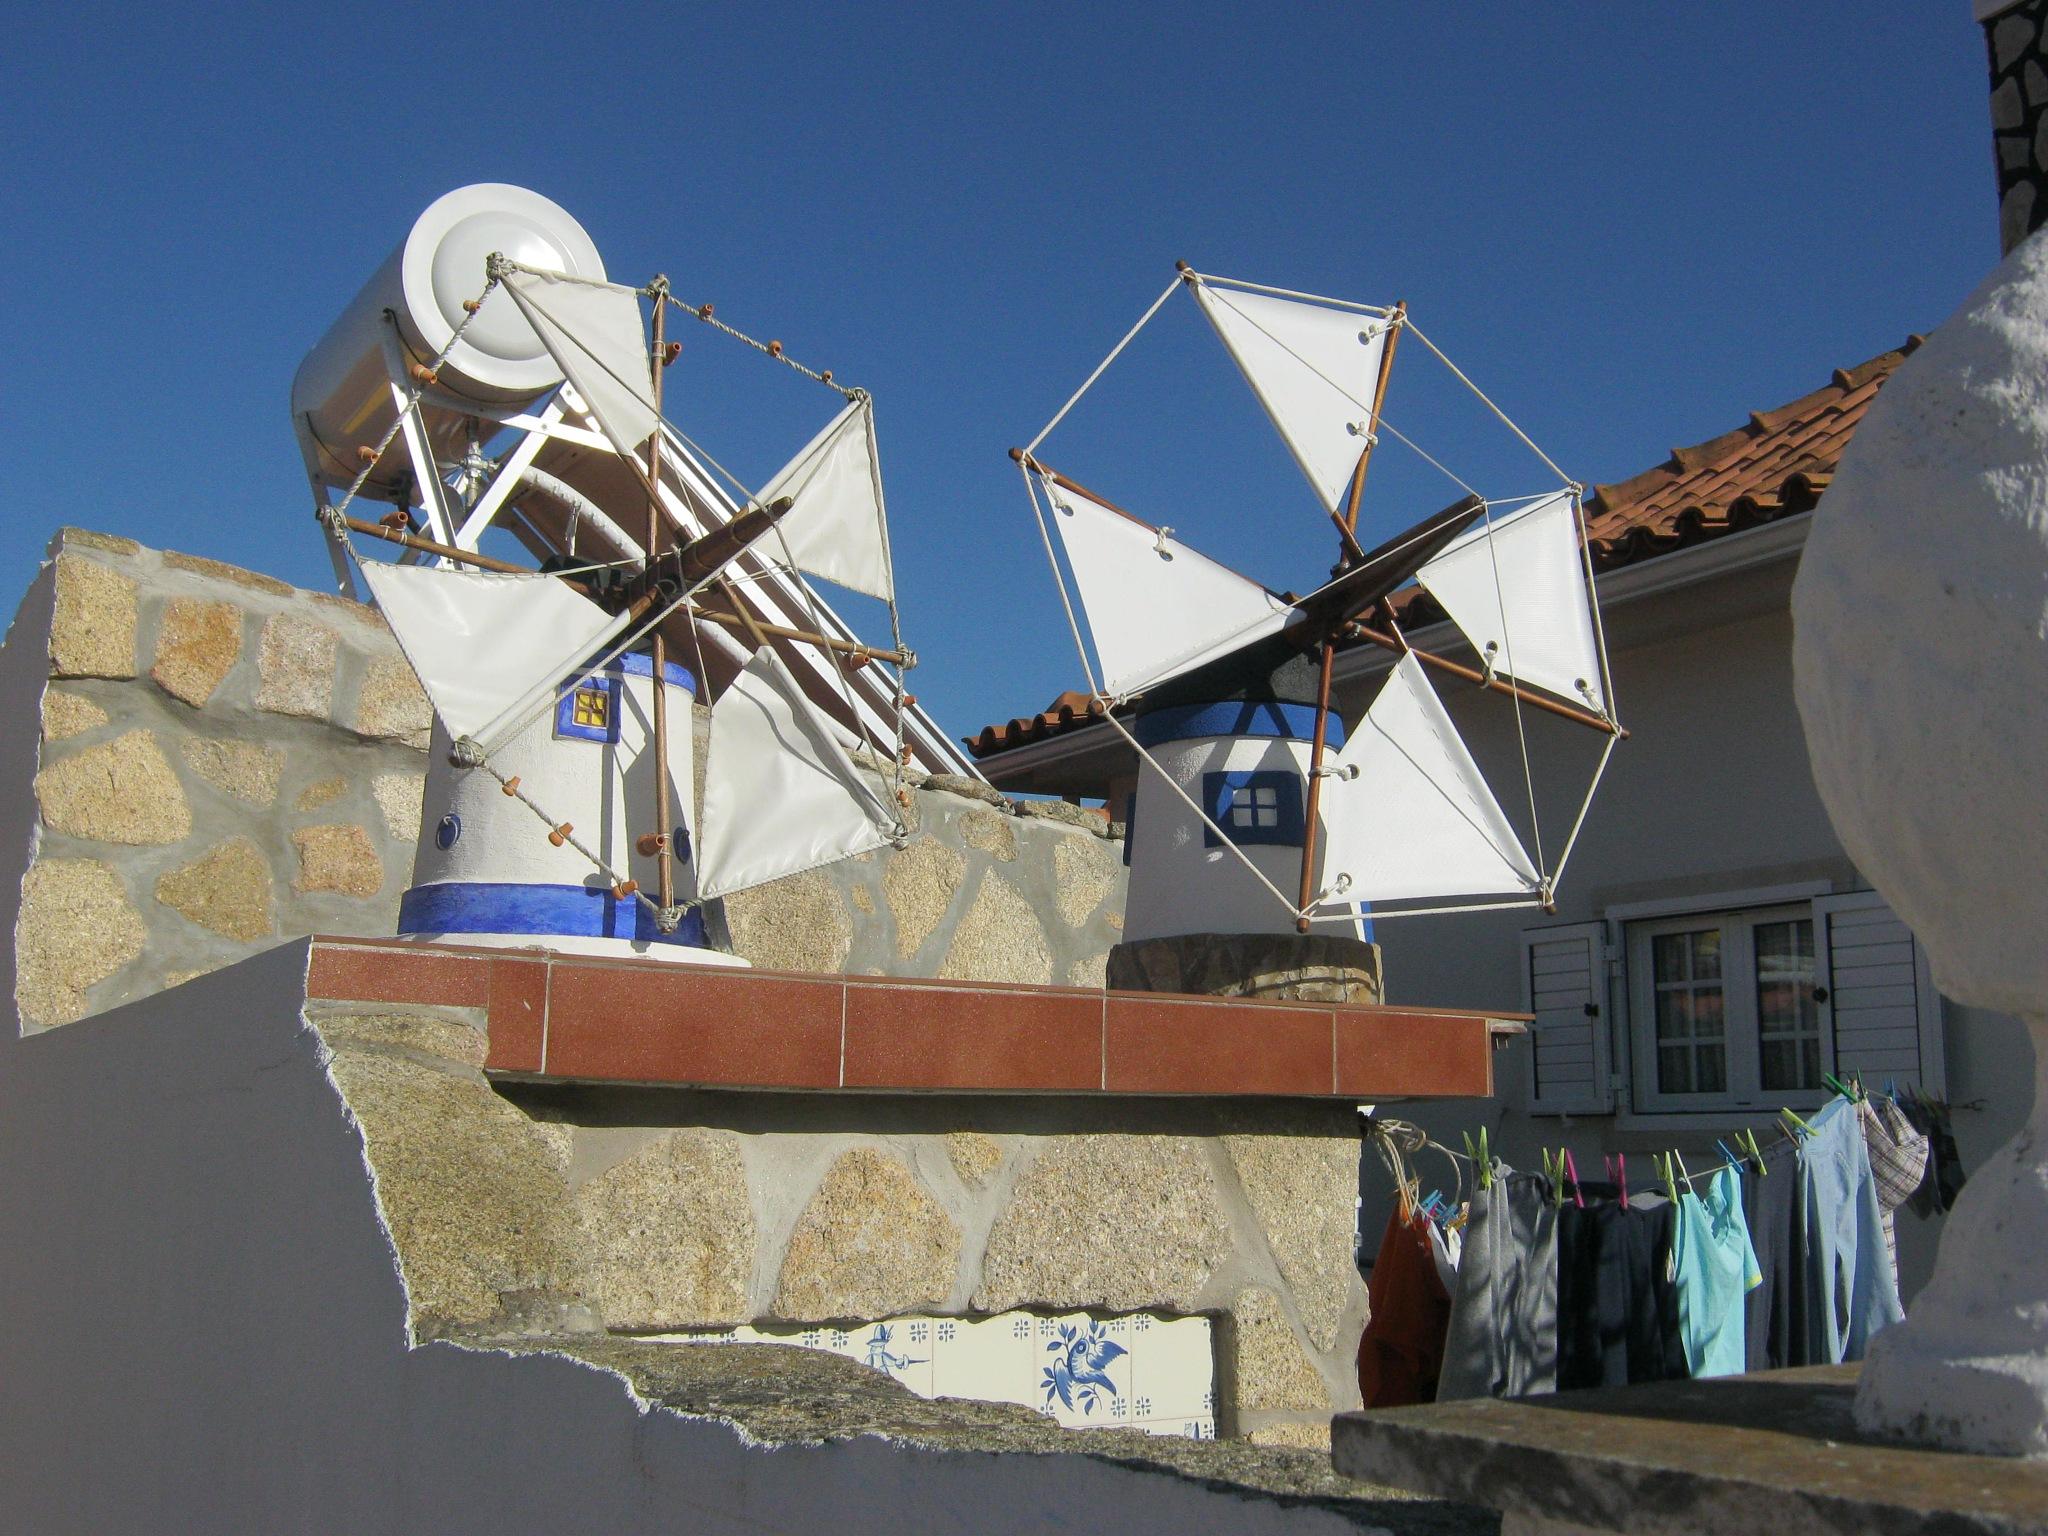 moinhos de vento by angelo.costa3